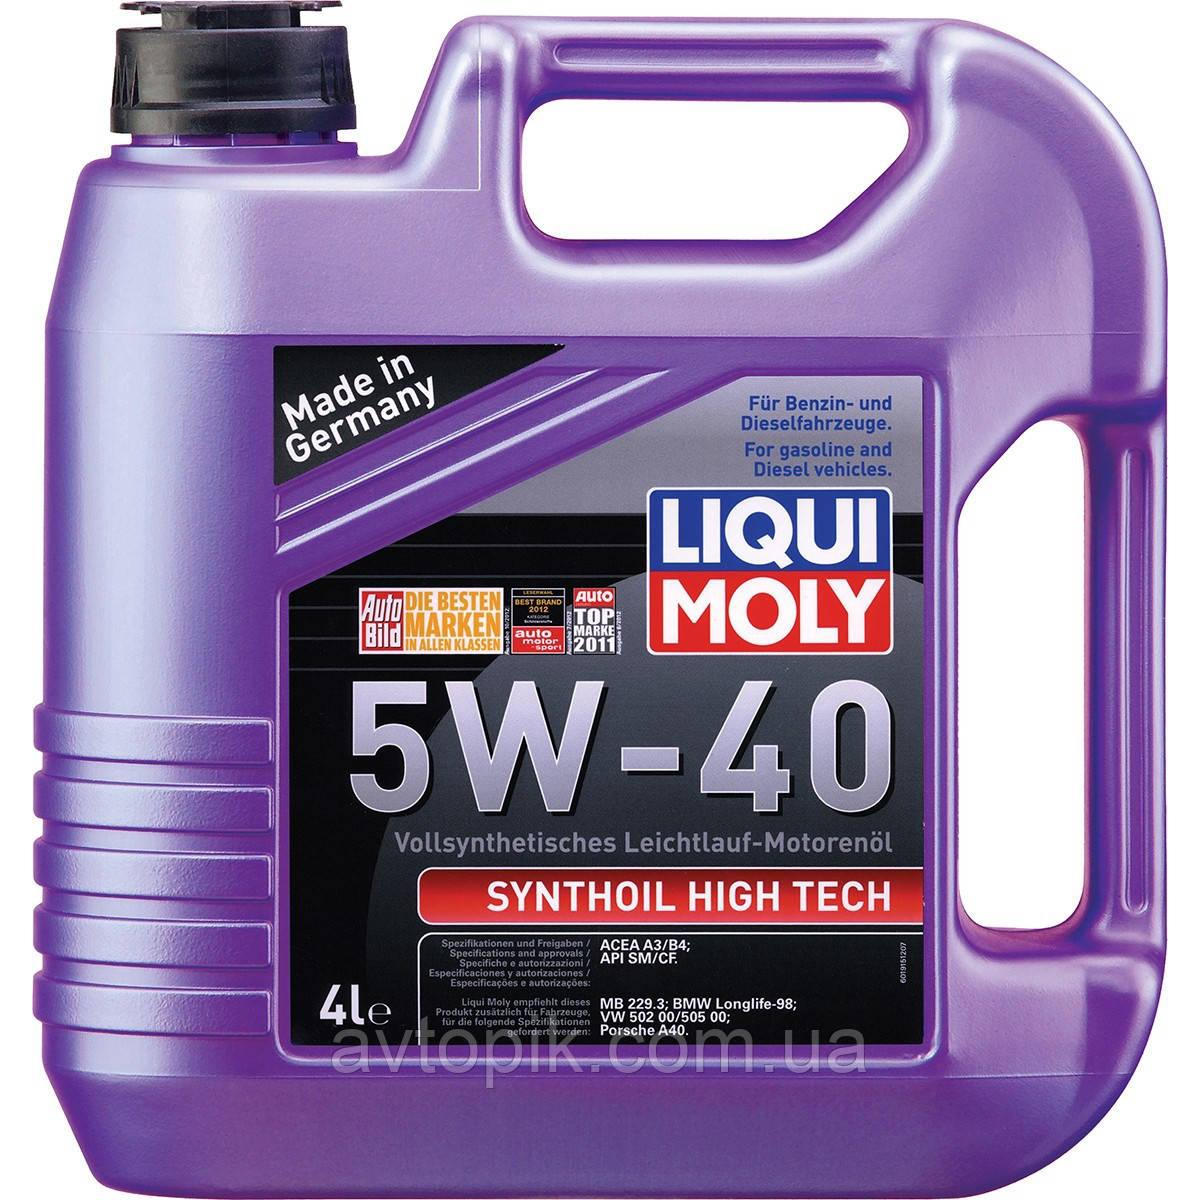 Моторное масло Liqui Moly Synthoil High Tech 5W-40 (4л.)